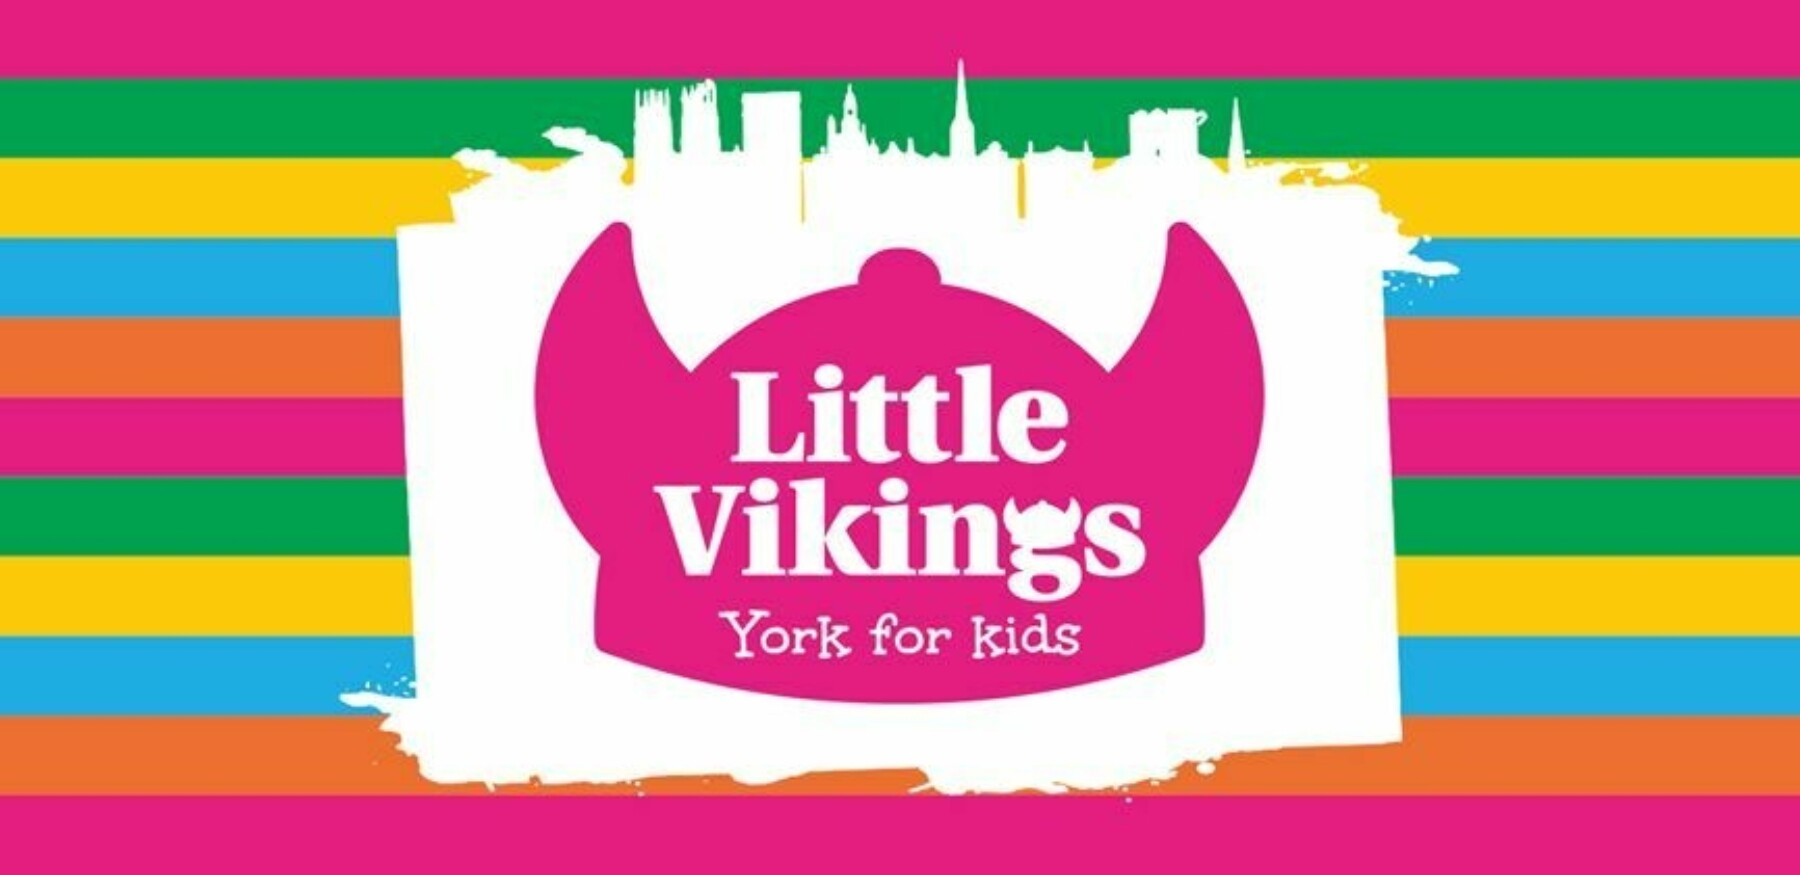 Little Vikings Facebook Cover Image